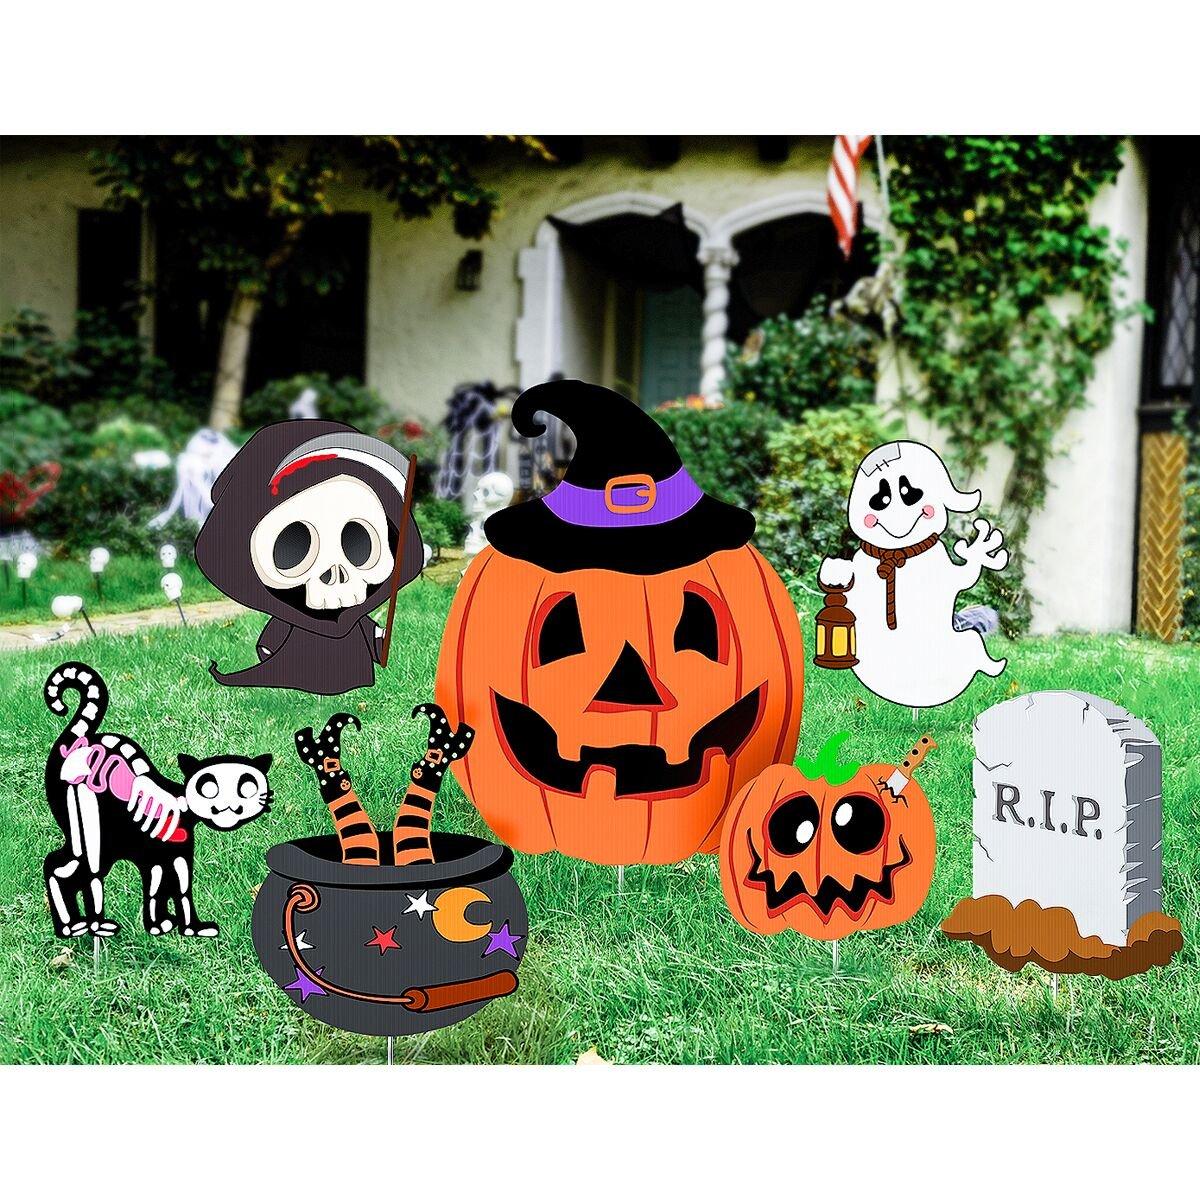 Unomor Halloween Yard Decorations Outdoor Skeleton Ghost and Pumpkin Yard Stake Signs Set, 7 Pack by Unomor